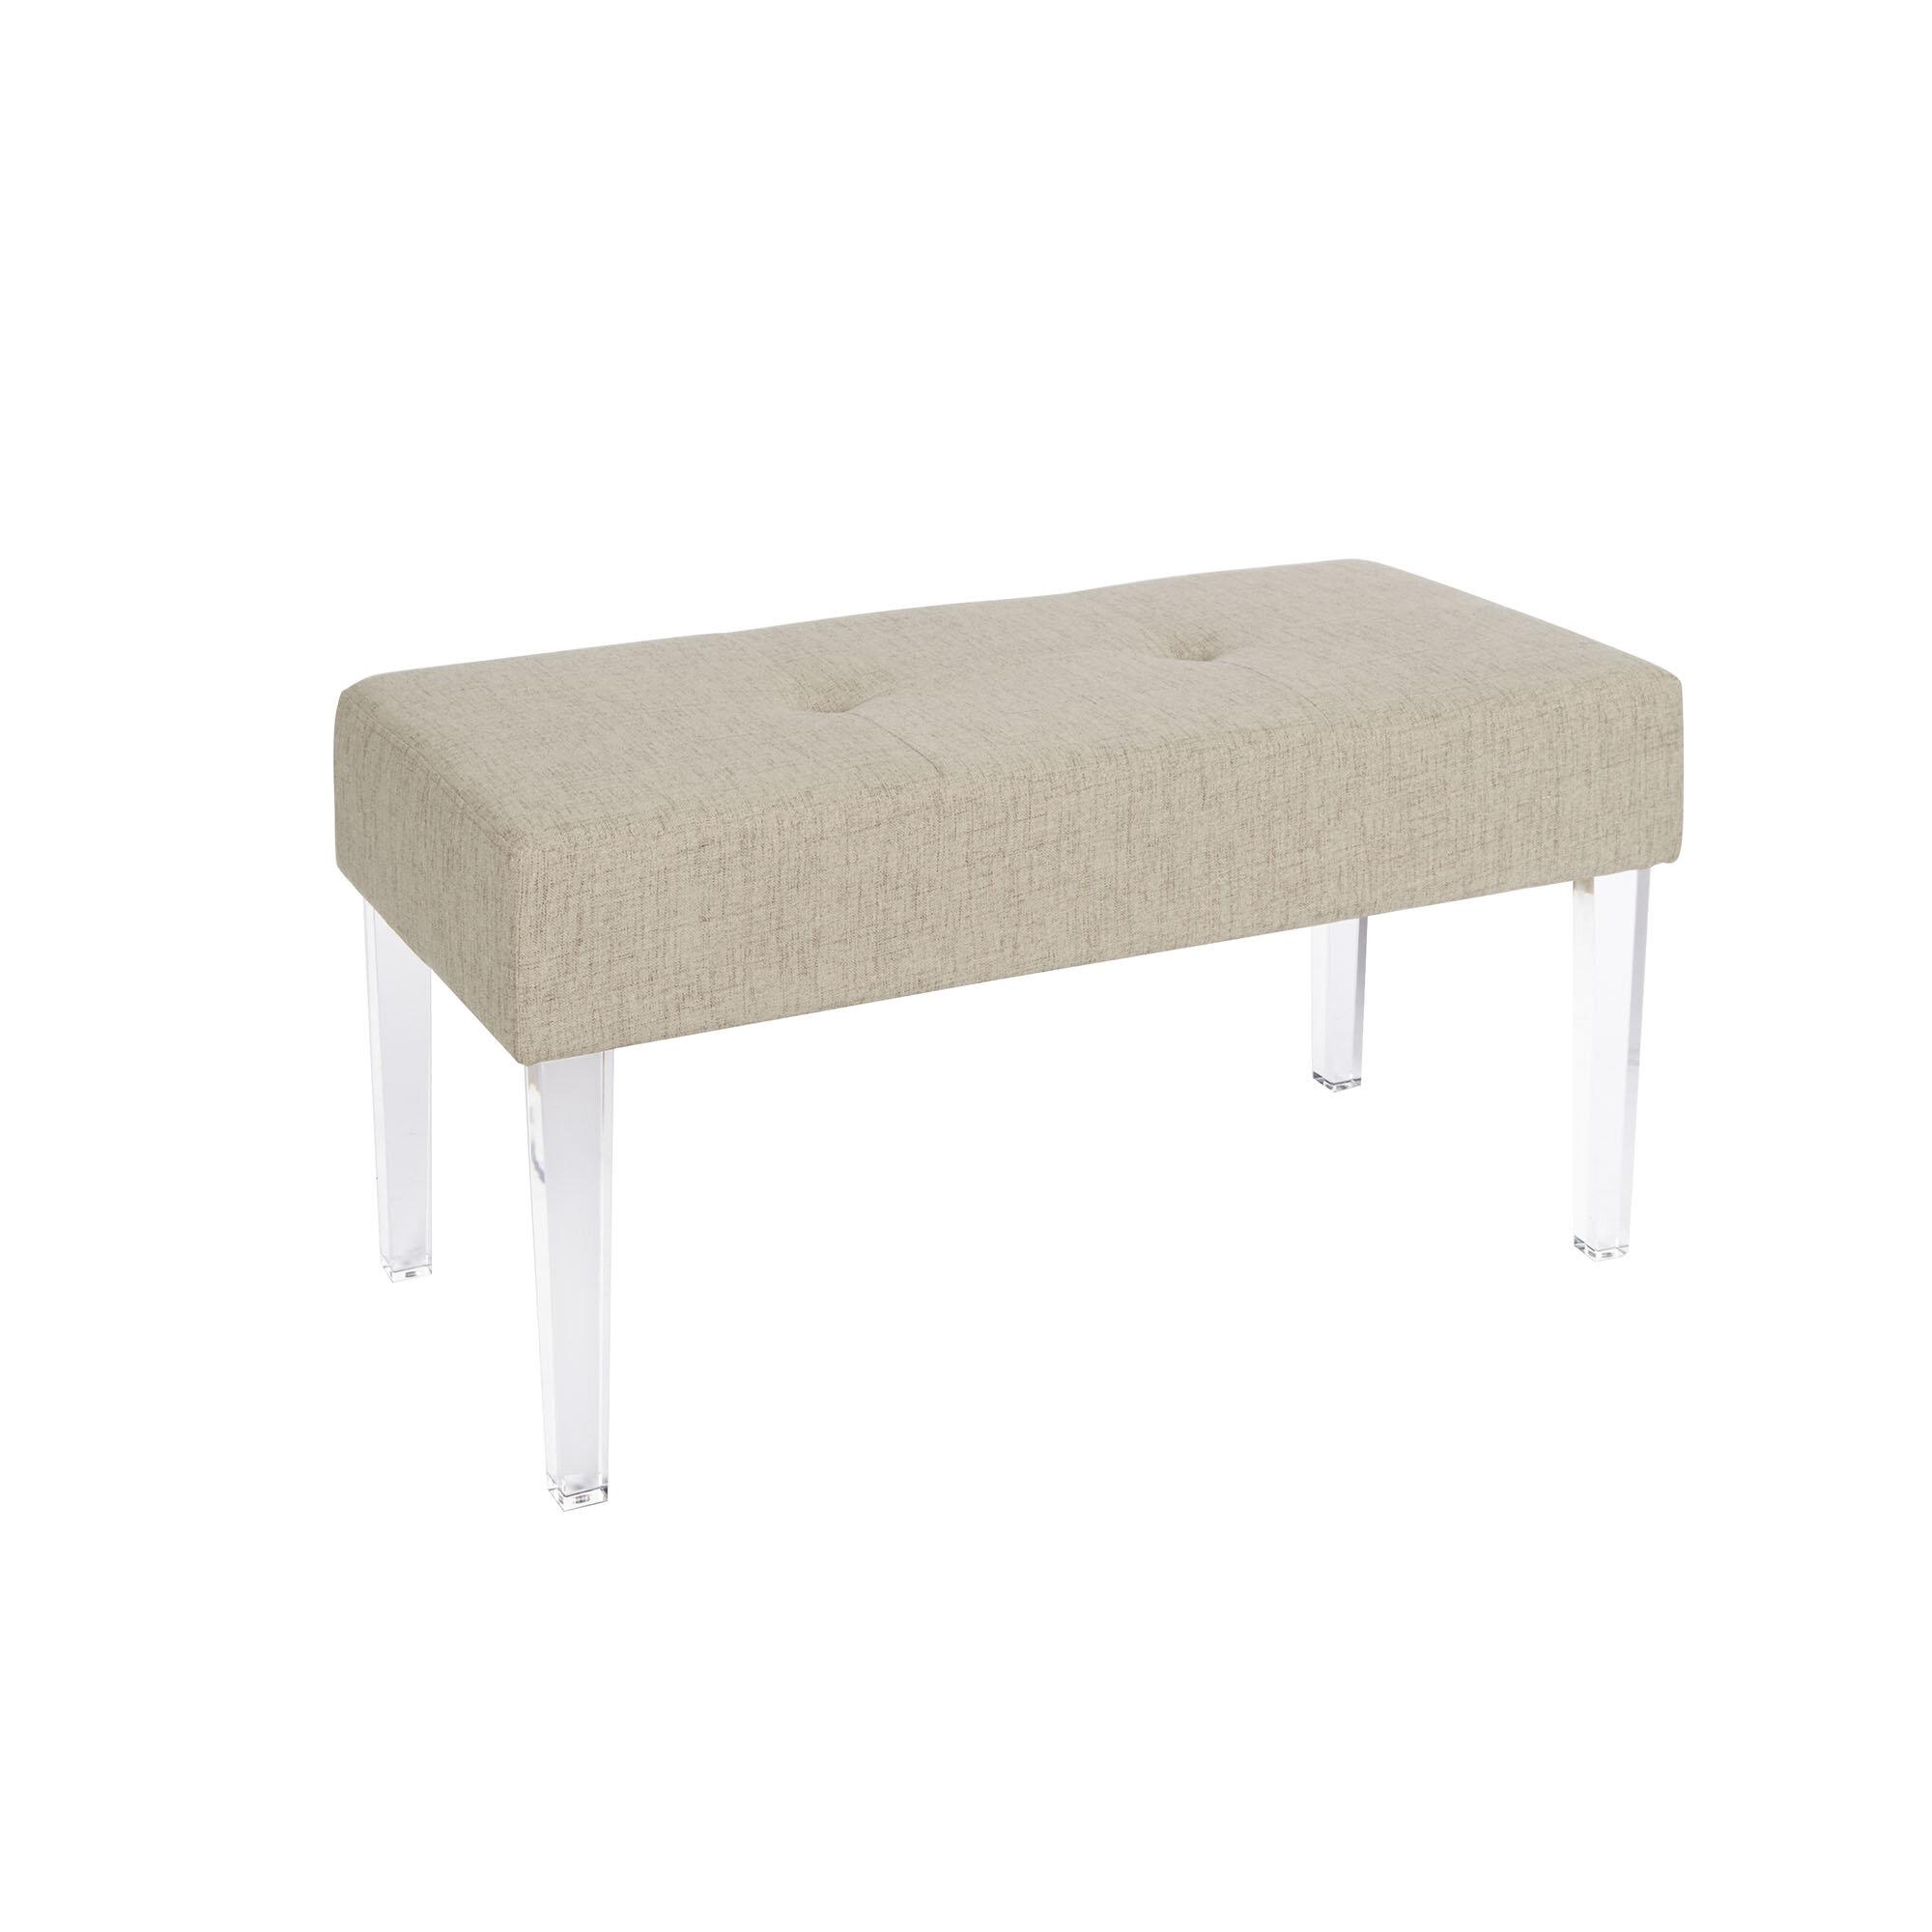 Amey Acrylic Leg Rectangular Upholstered Bench